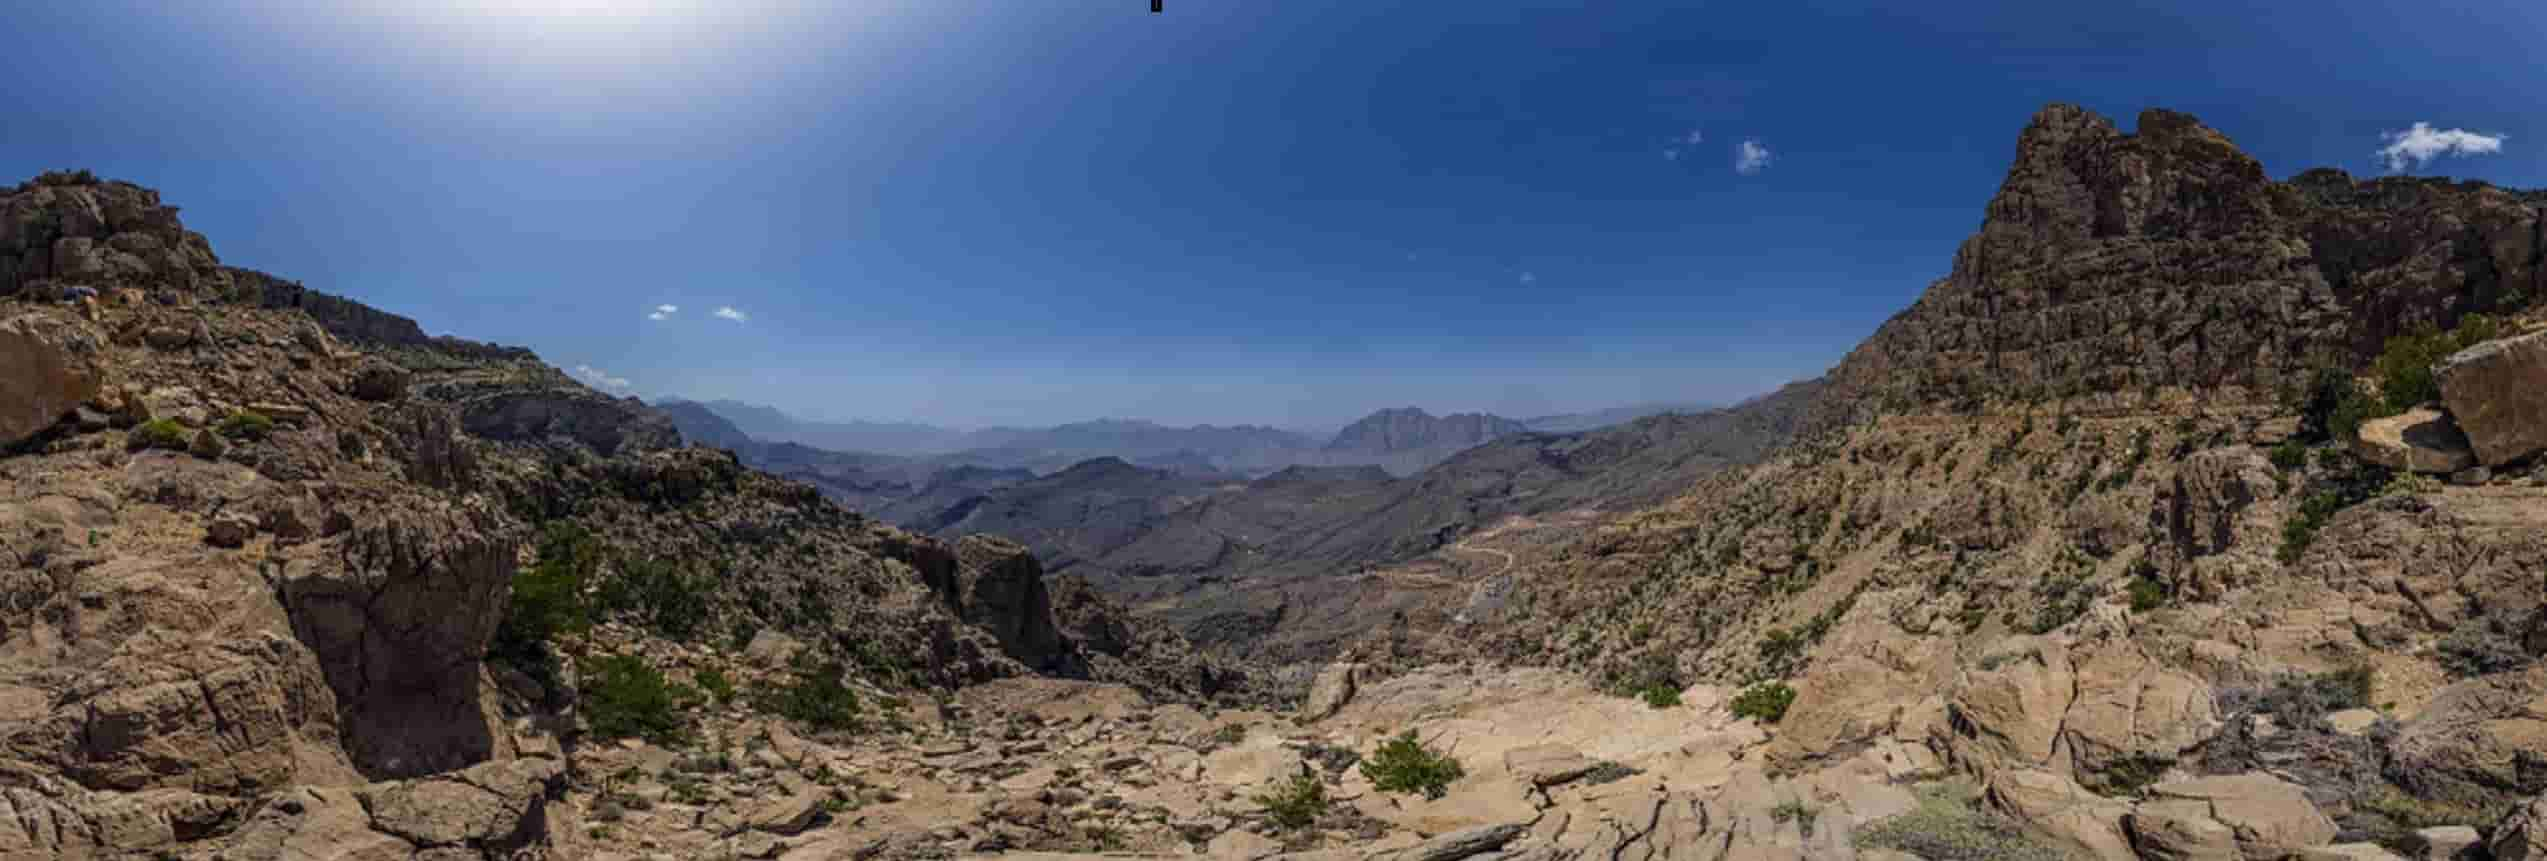 Jebel-Shams-Pano